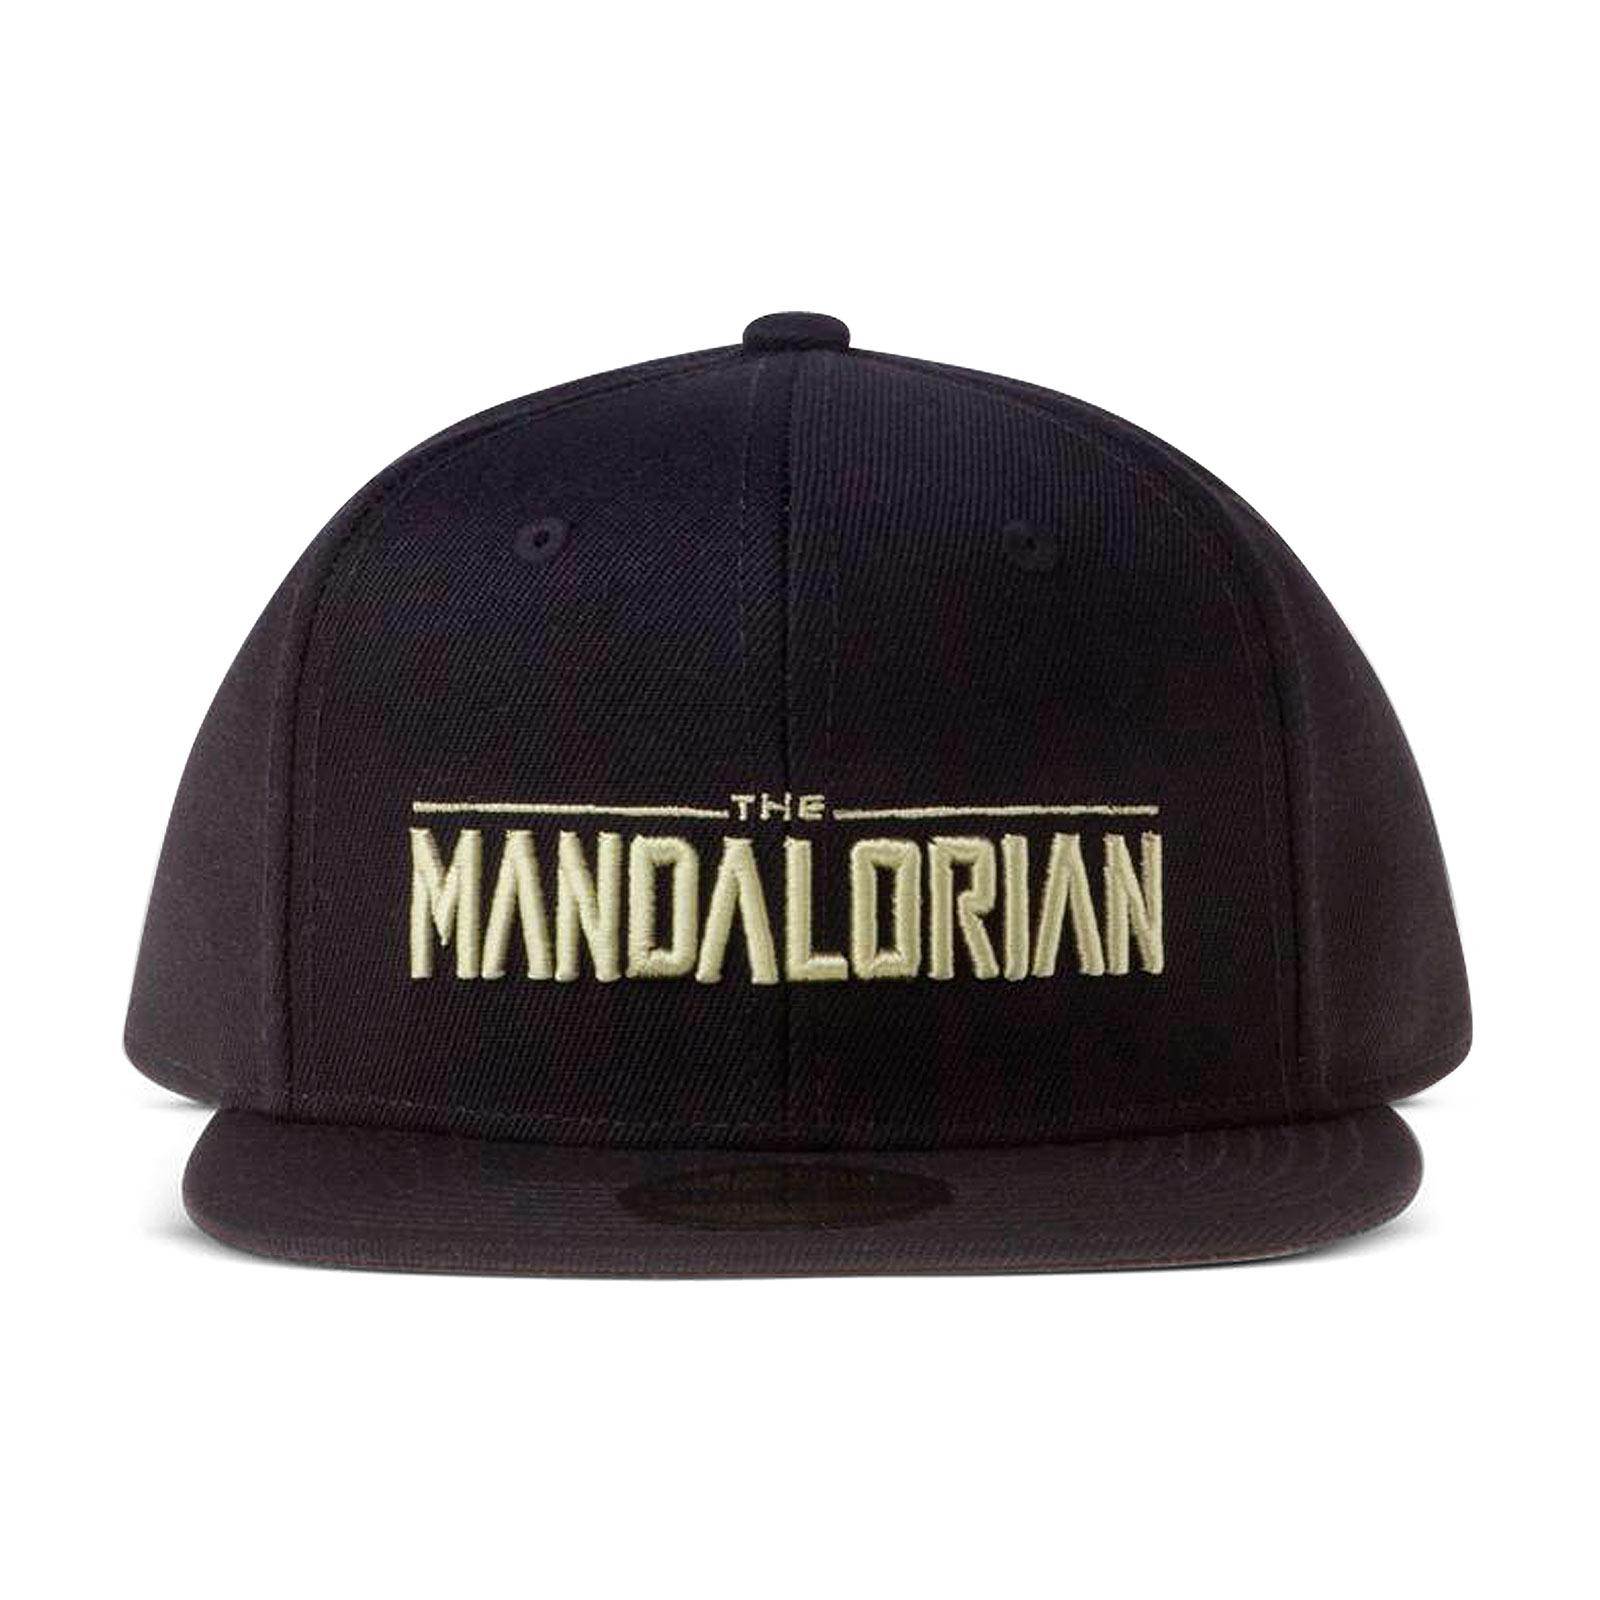 The Mandalorian Logo Snapback Cap schwarz - Star Wars